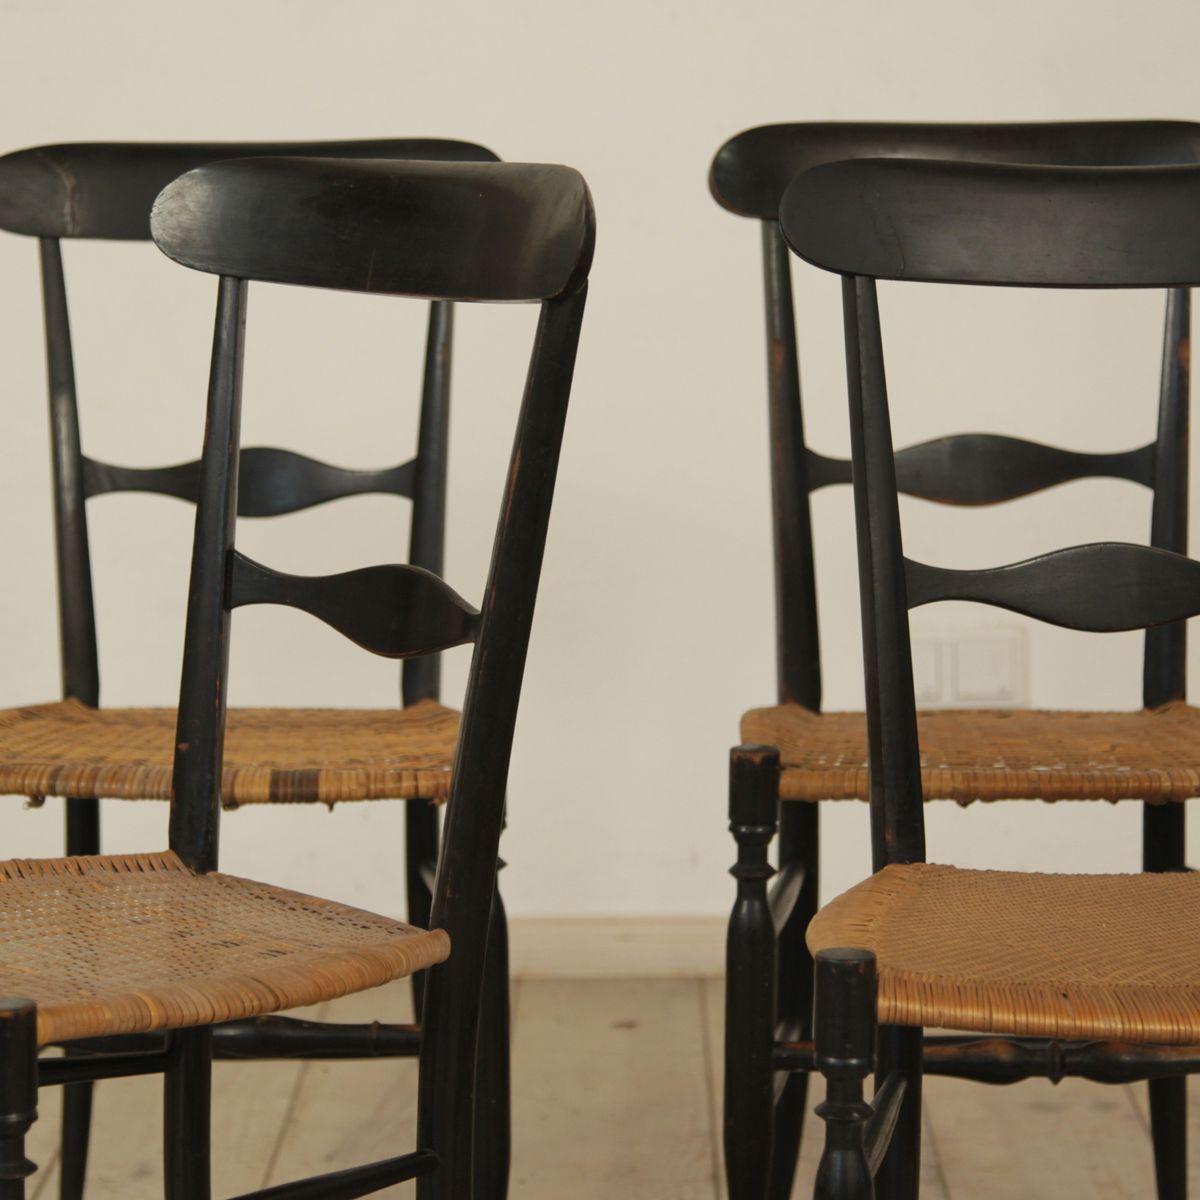 italian wicker dining chairs by chiavari legerissima set